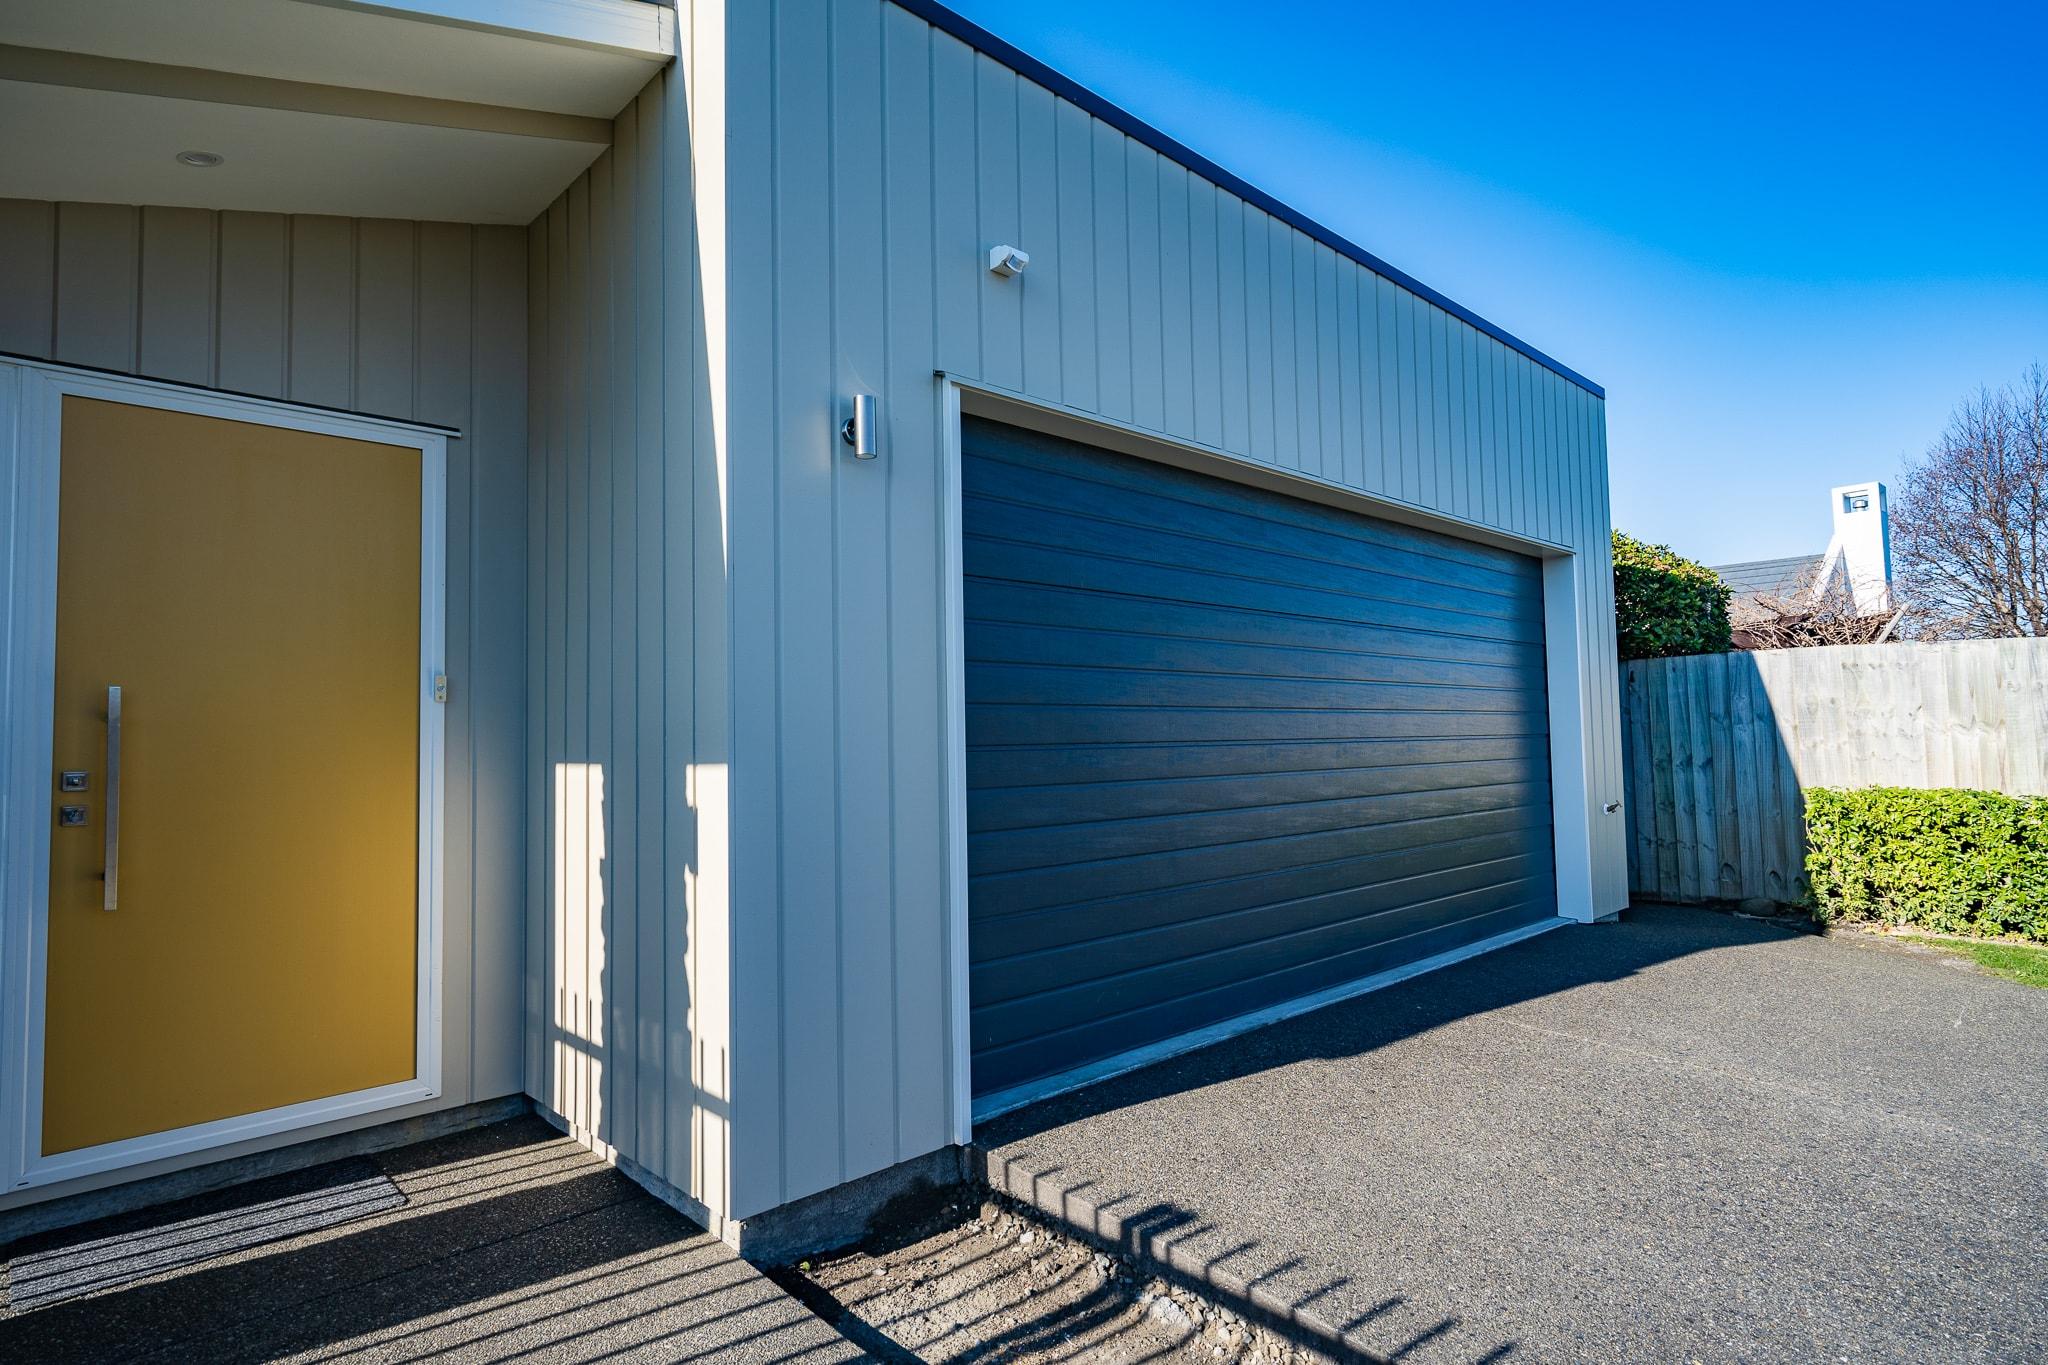 robertson_building_canterbury_ltd_ballarat_small_28-min.jpg